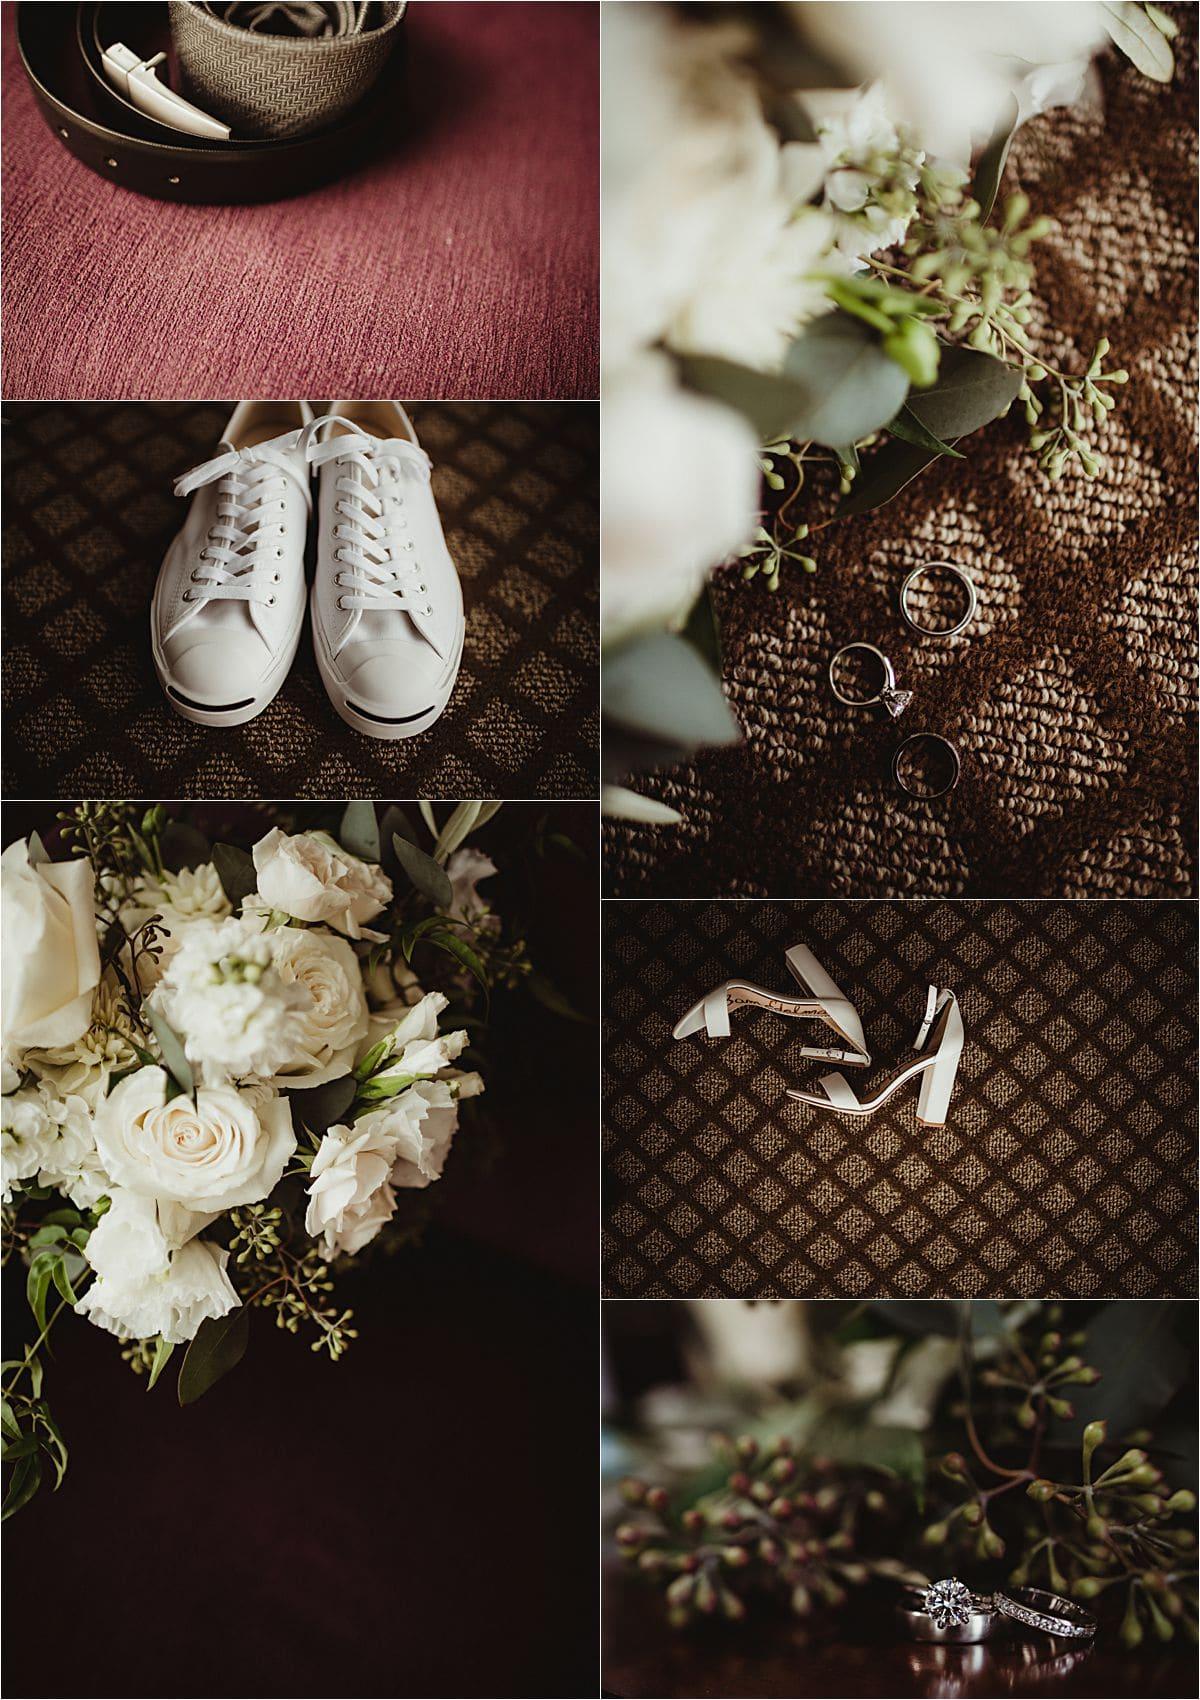 Glamorous September Wedding Getting Ready Details